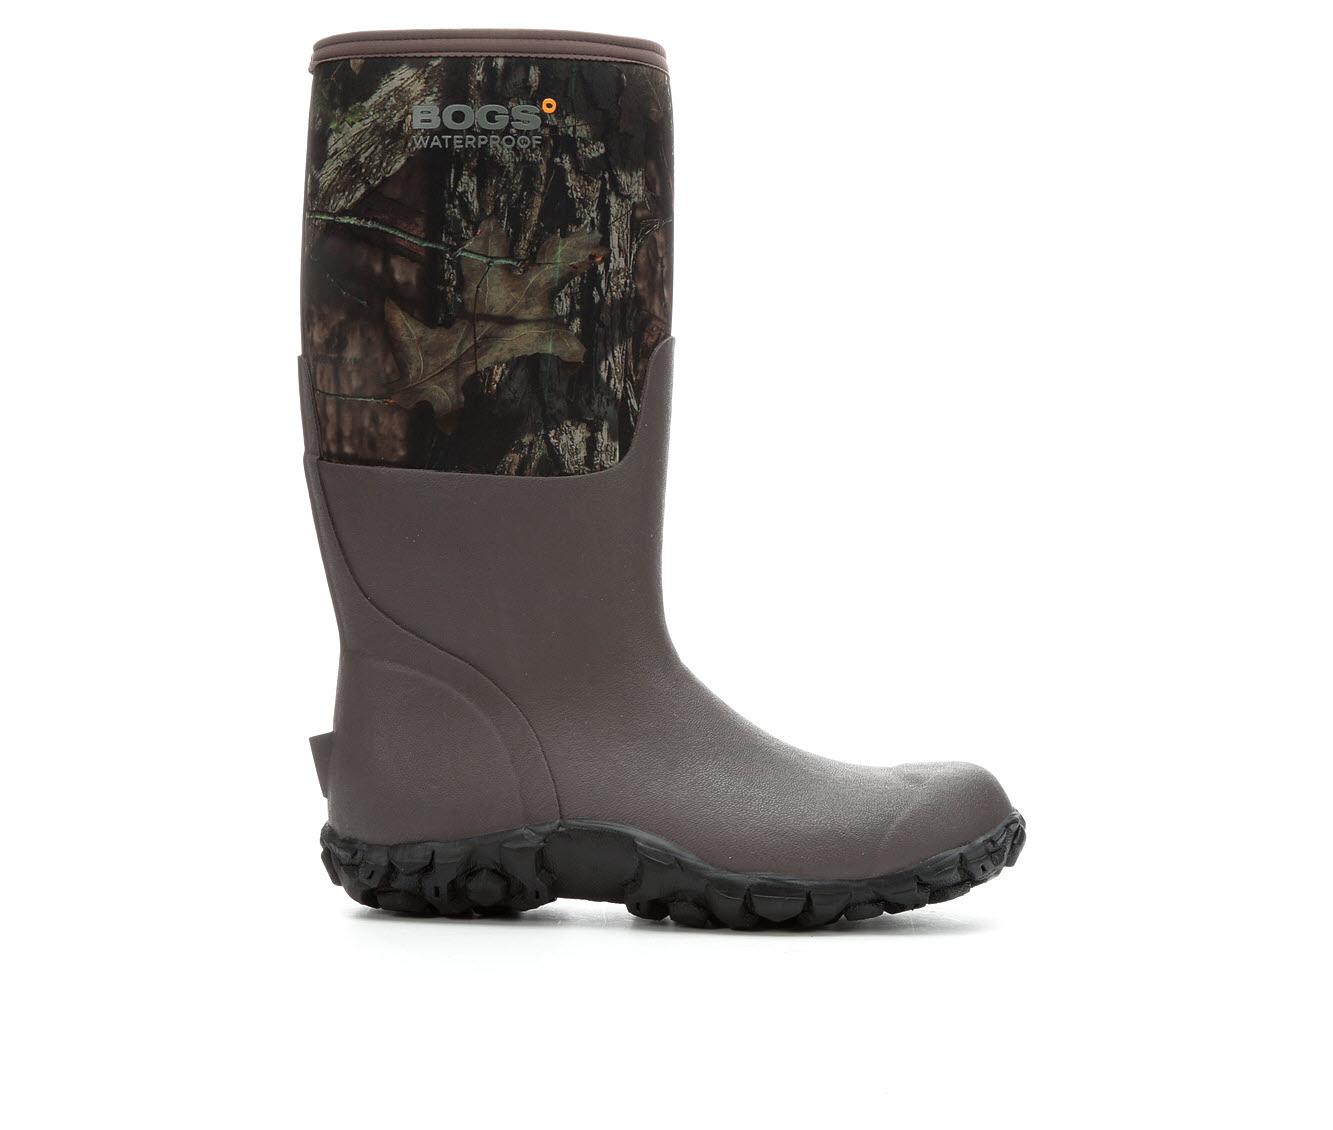 Bogs Footwear Madras Waterproof Men's Boots (Brown Nylon)